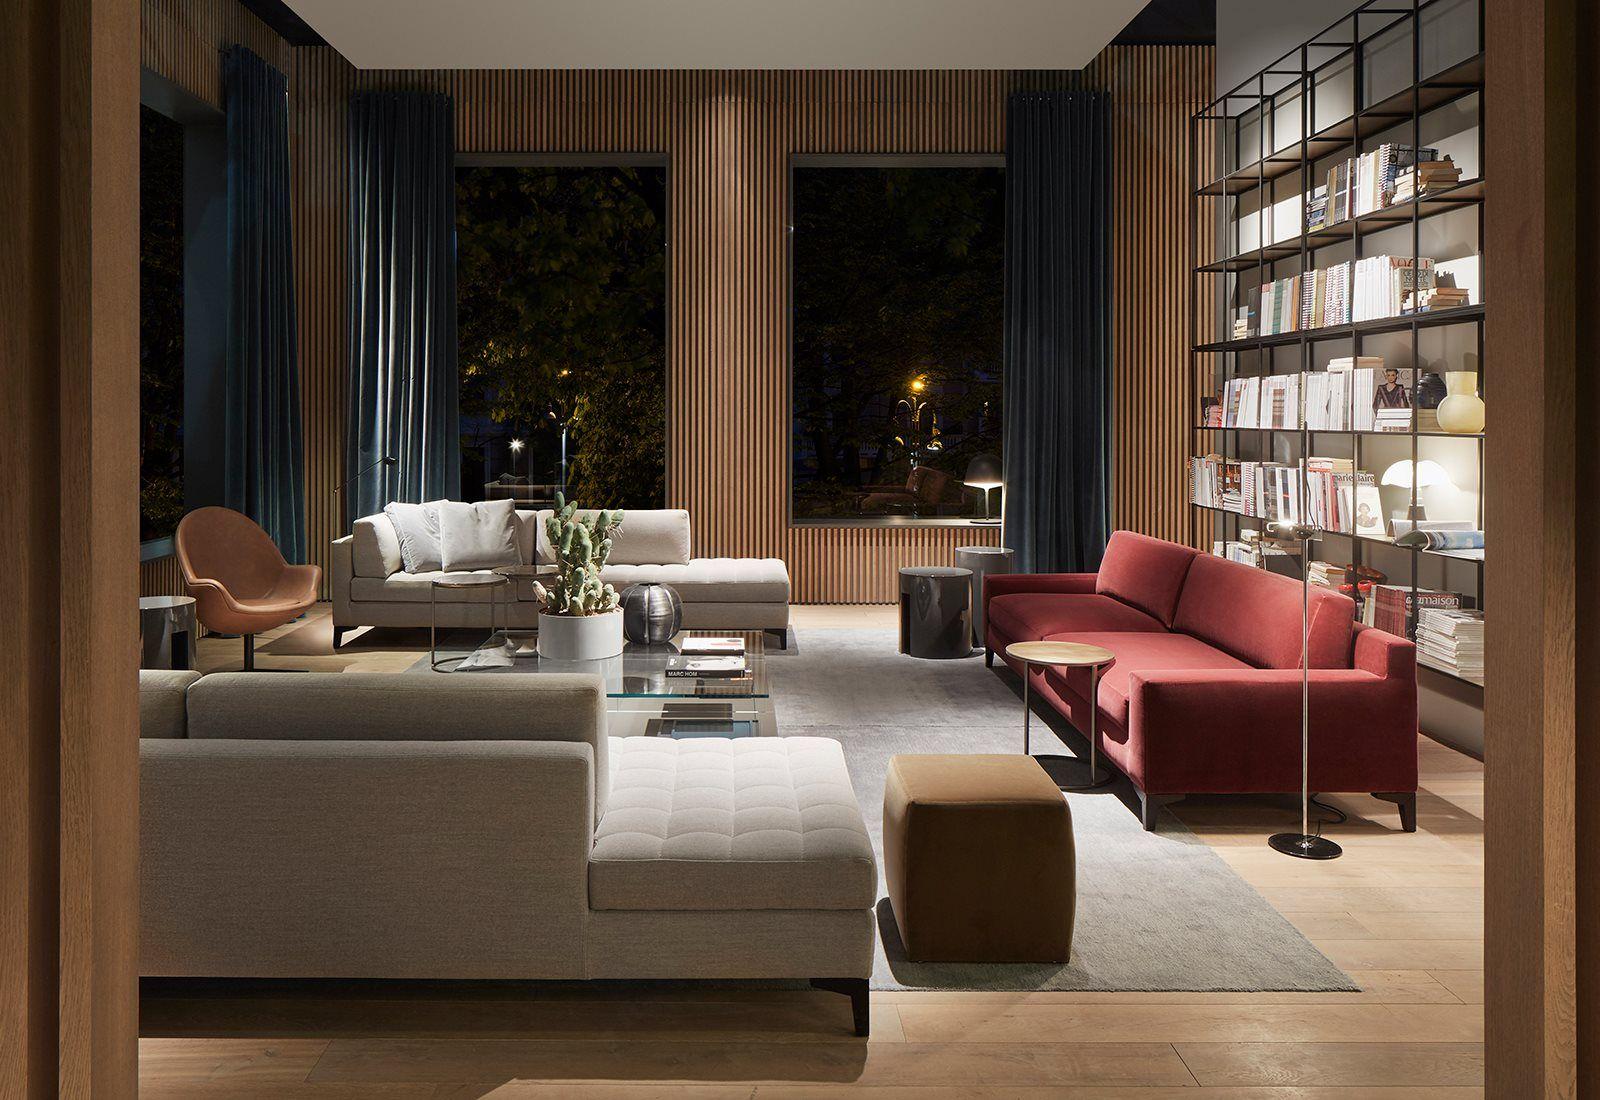 Prince Sofas Blue Living Room Interior Design Blue Couch Living Room Furniture fair living room furniture